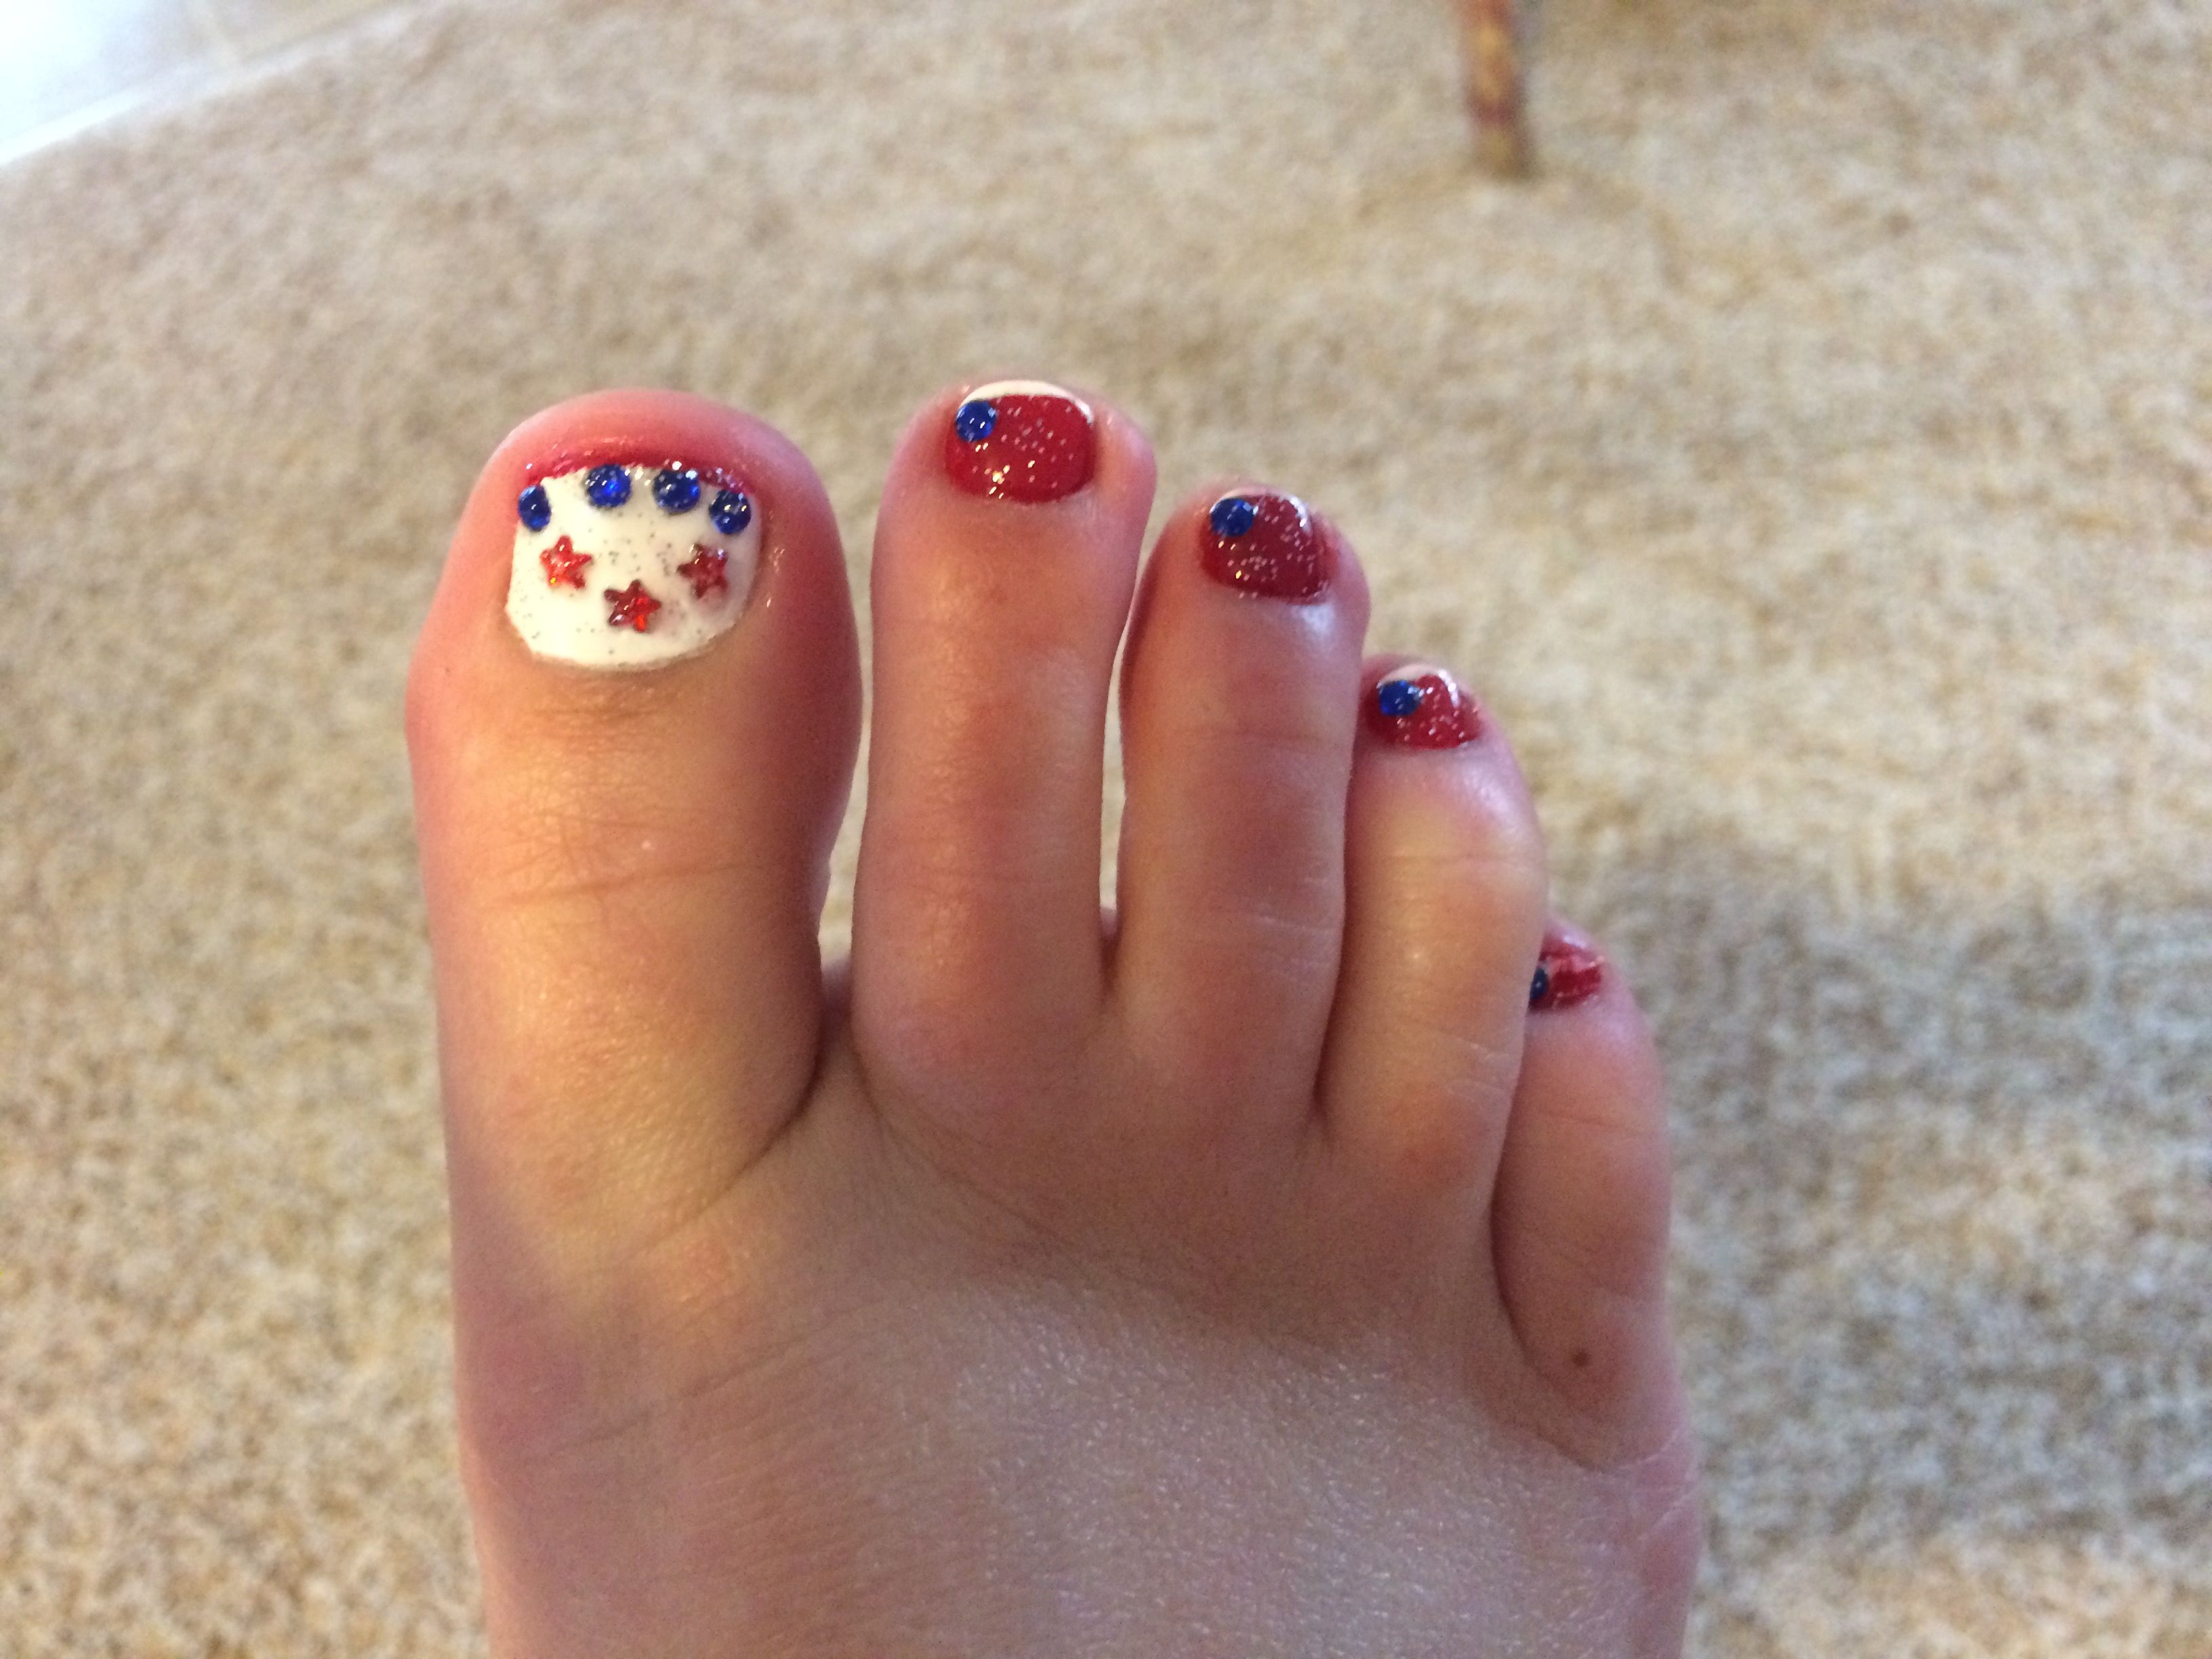 Memorial Day Toe Nail Design Patriotic Toes Nail Designs By Kt